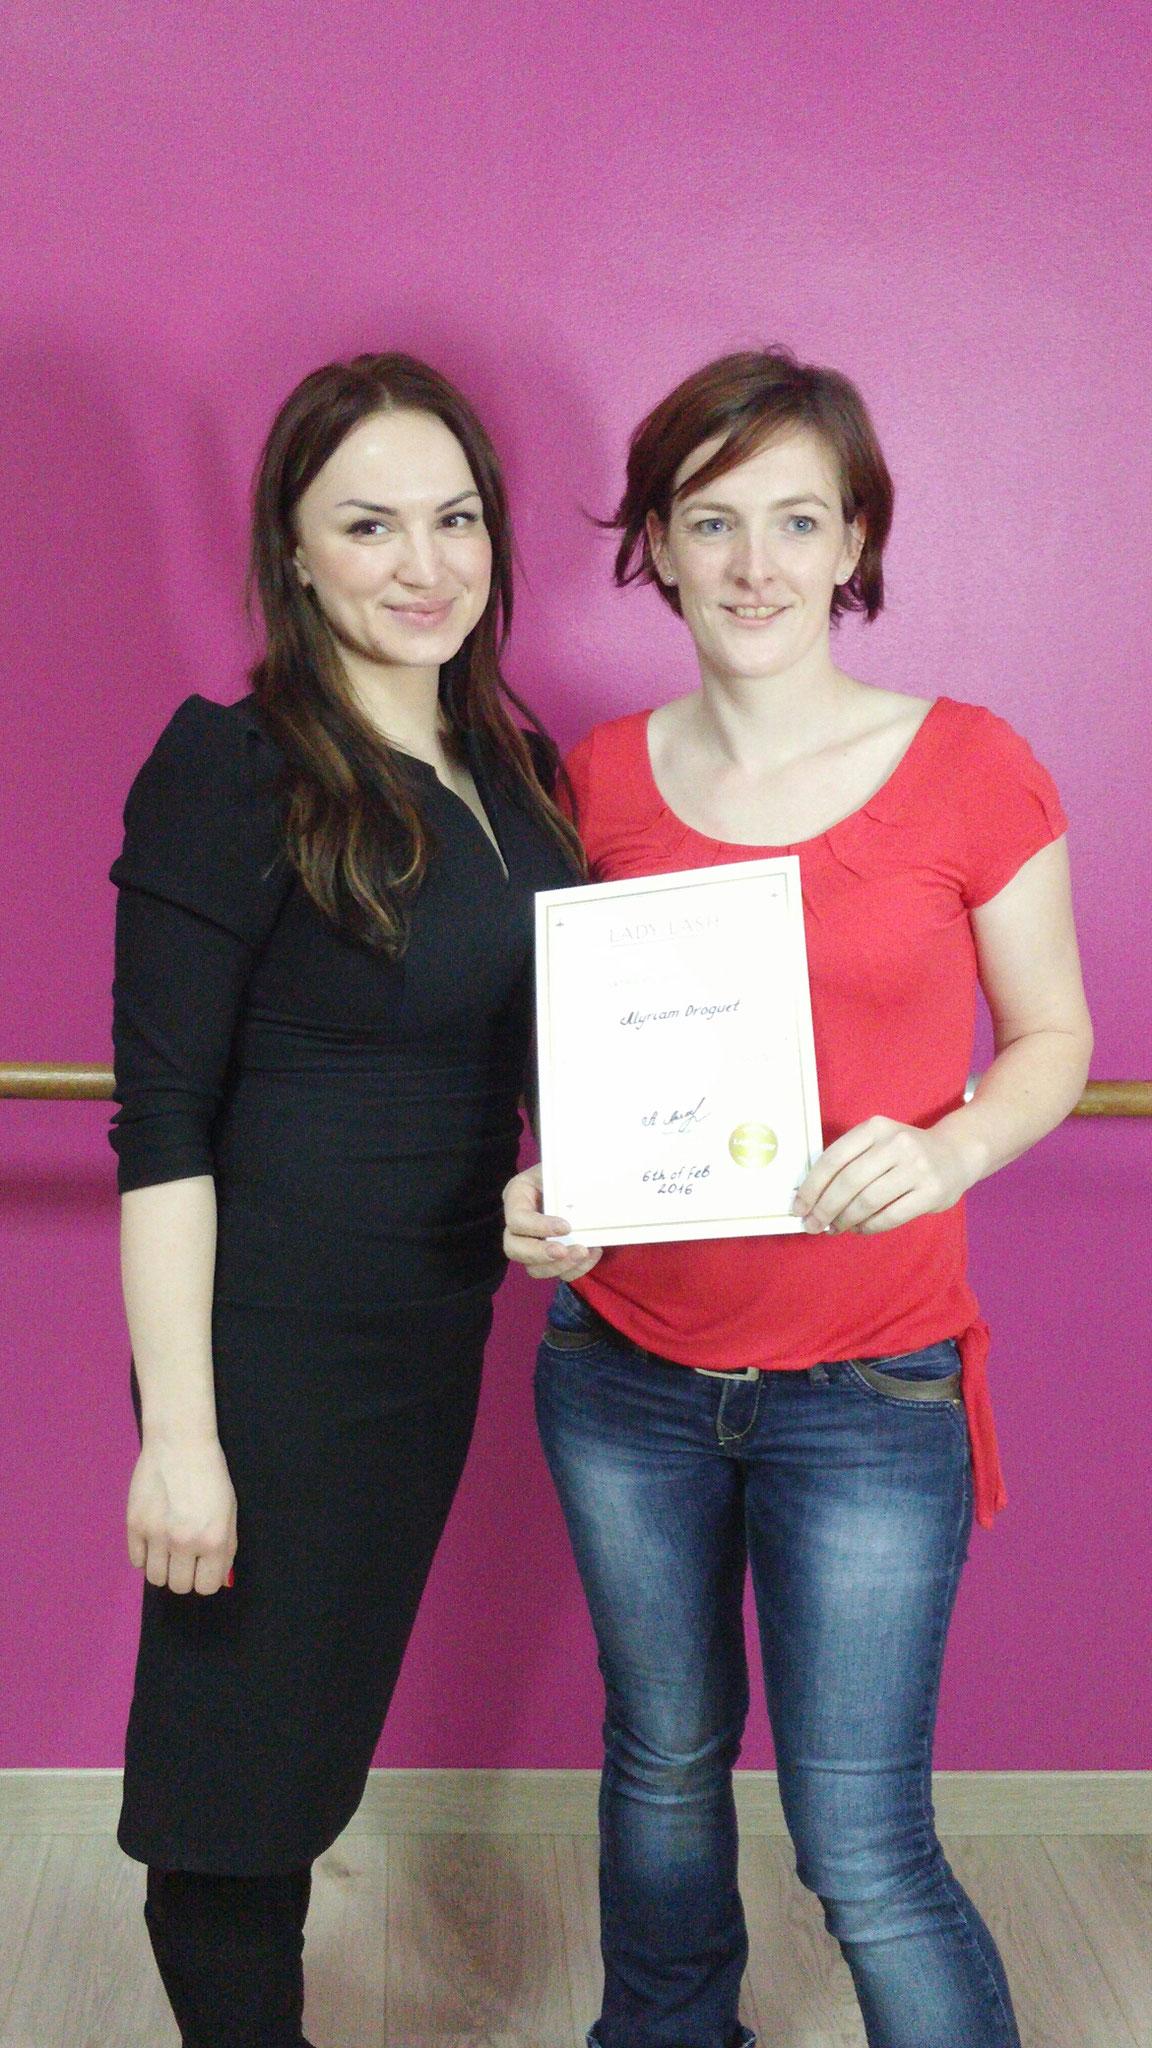 formation avec Hanna PUTJATO créatrice de la marque London Lash